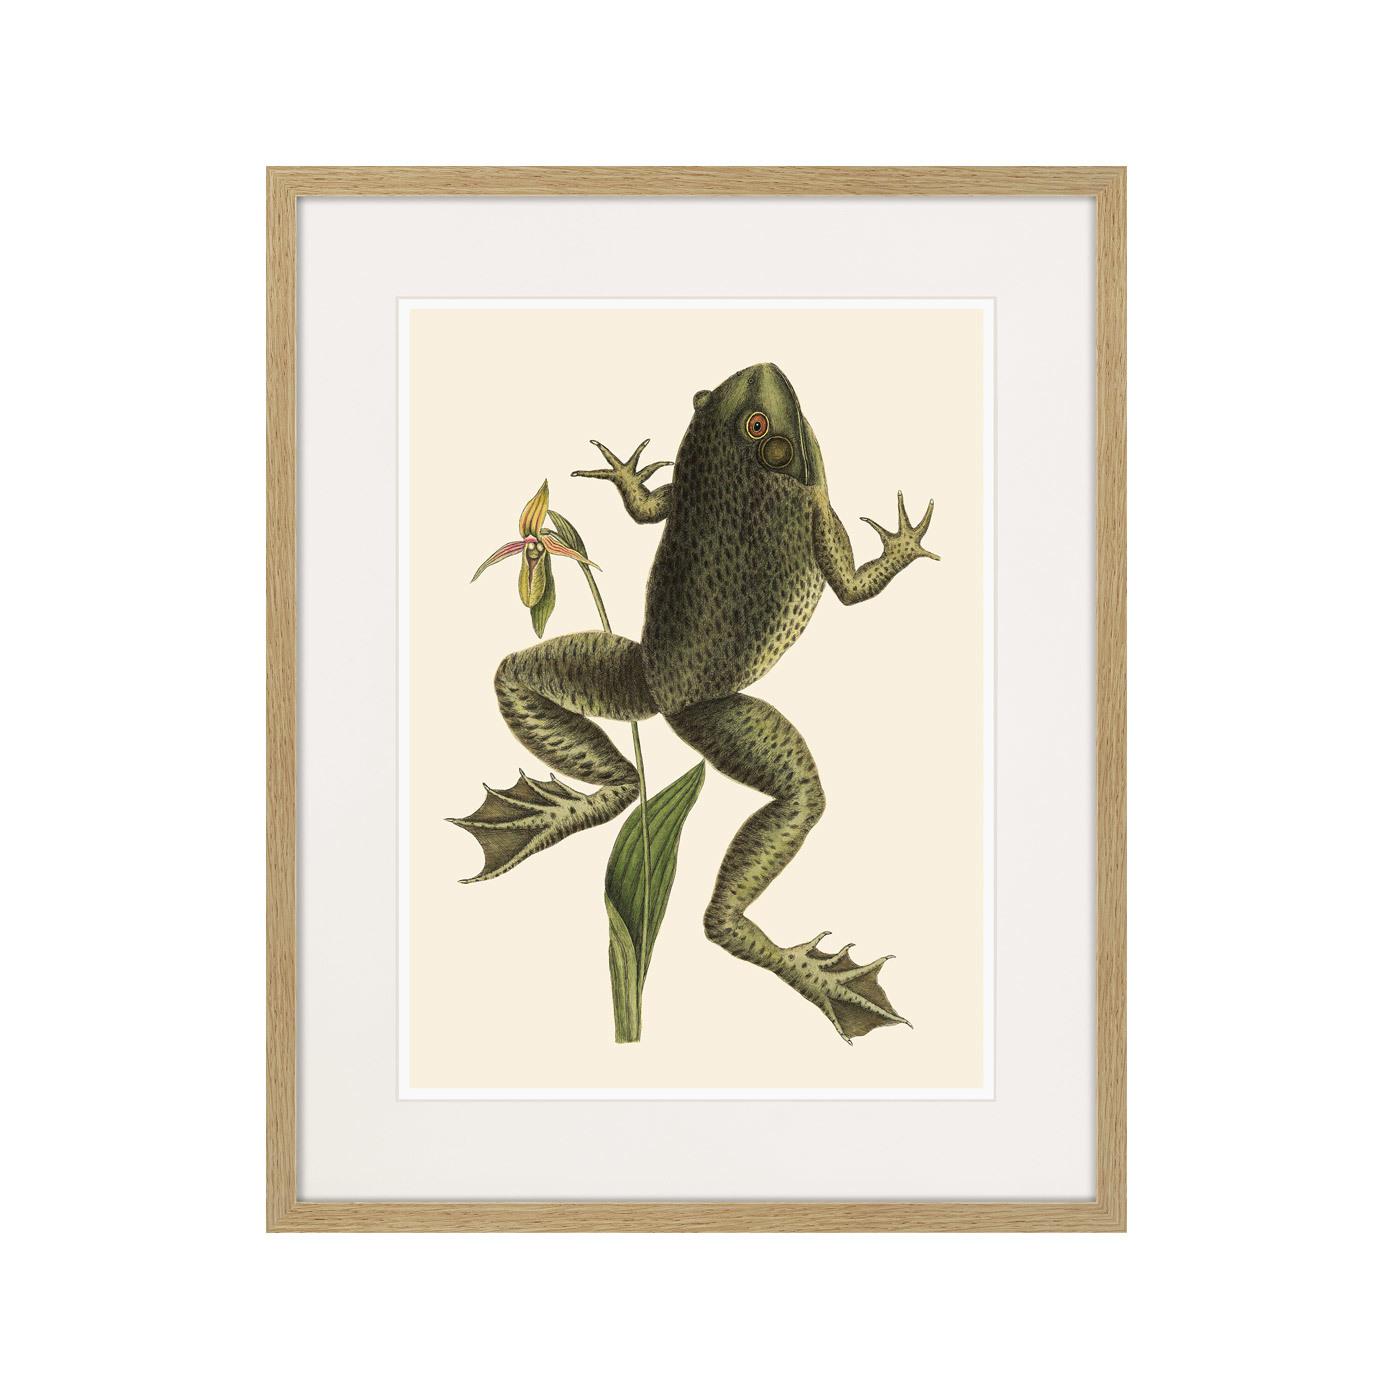 Big jumping frog, 1745г.